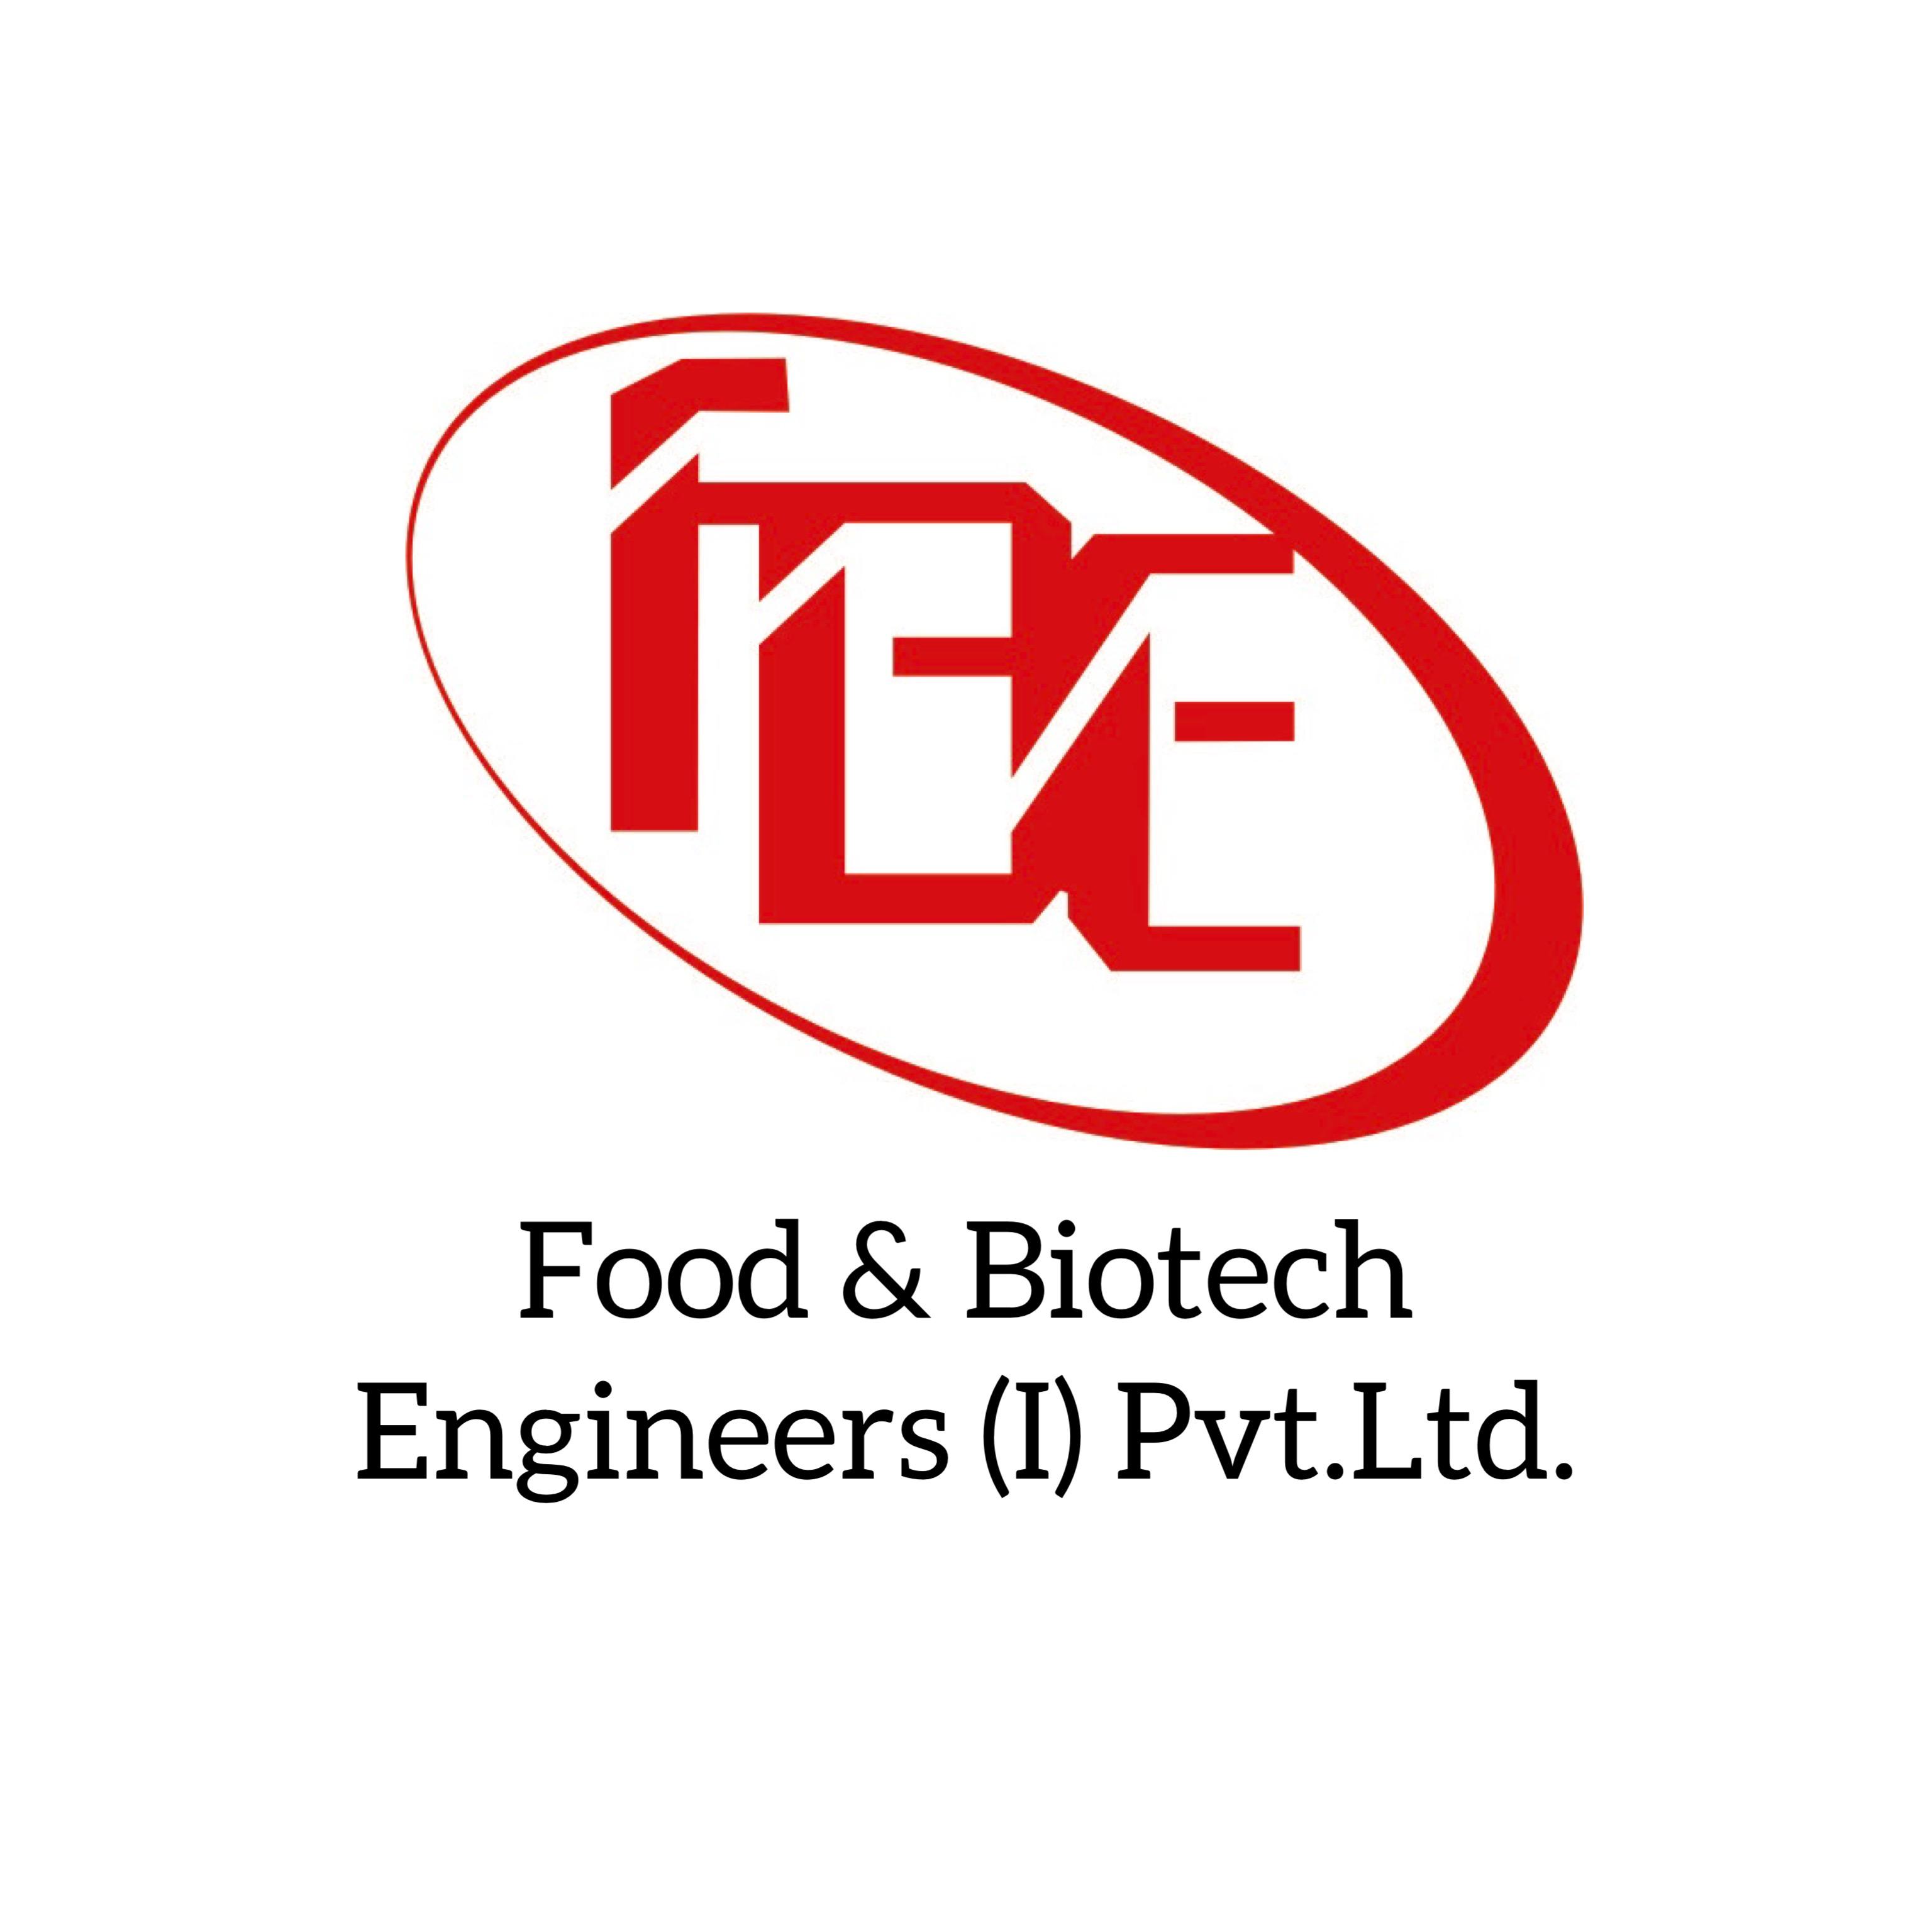 FOOD & BIOTECH ENGINEERS (INDIA) PVT. LTD.